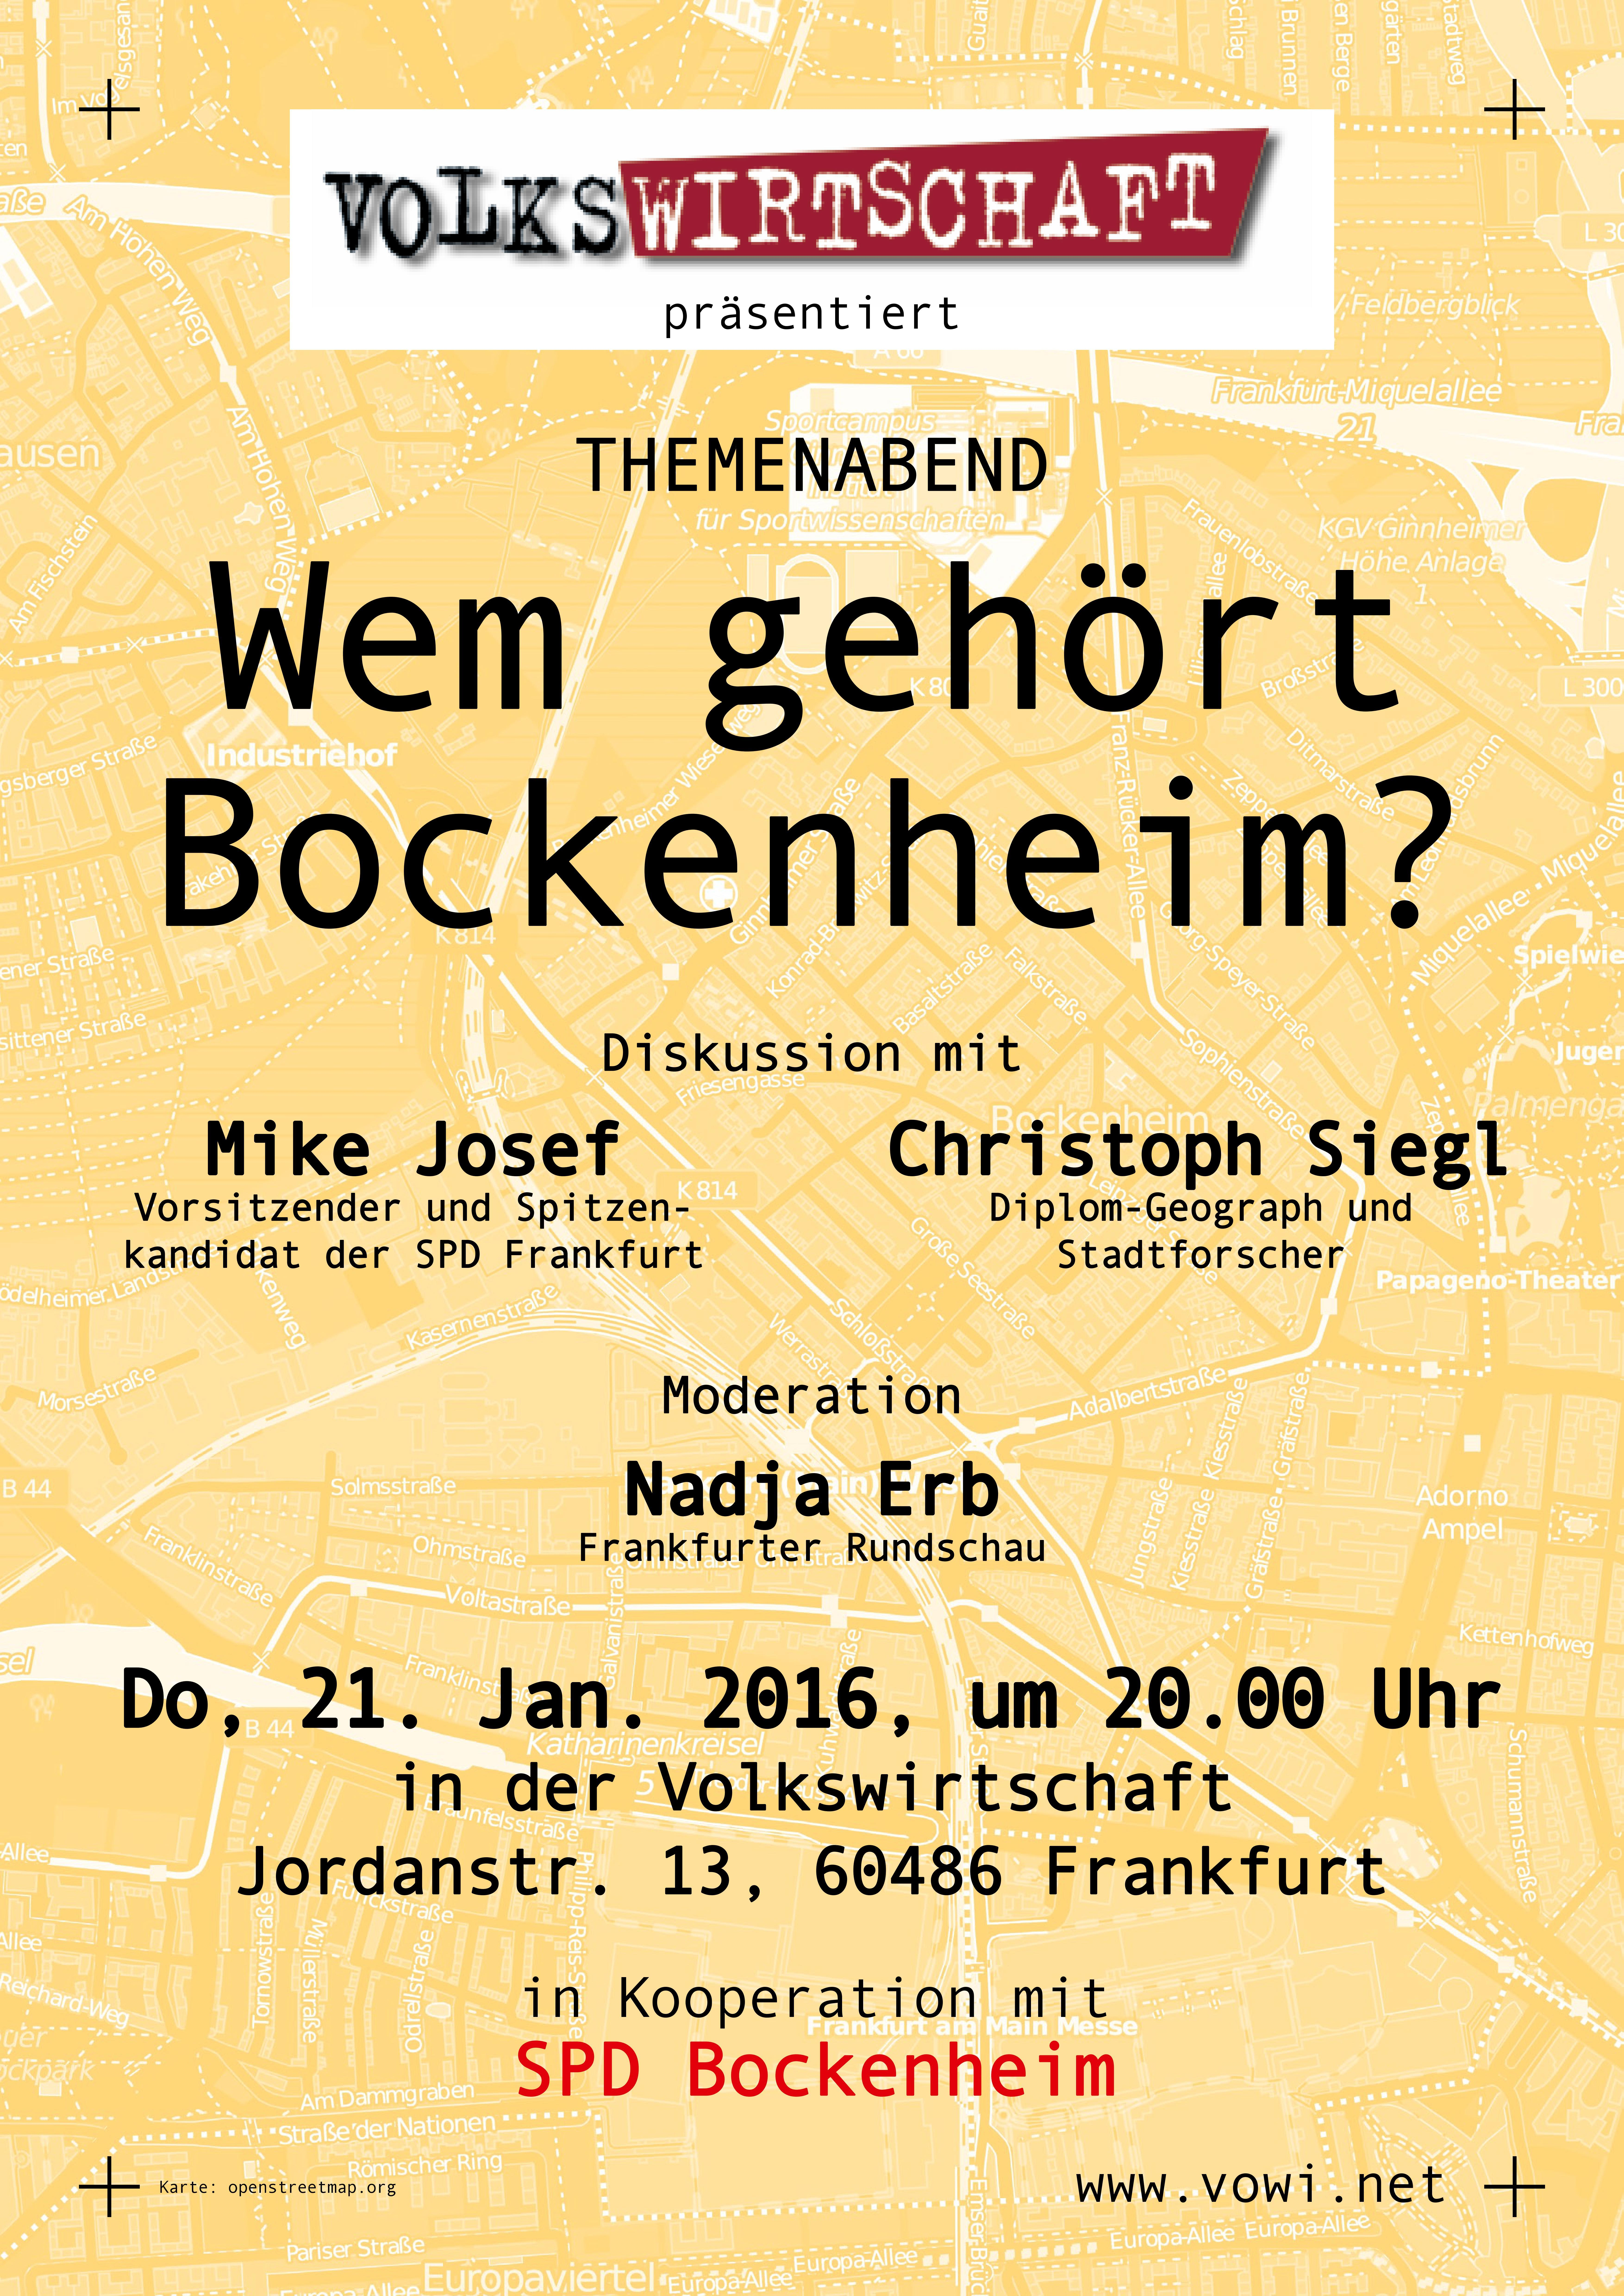 wem-gehoert-bockenheim-kopie